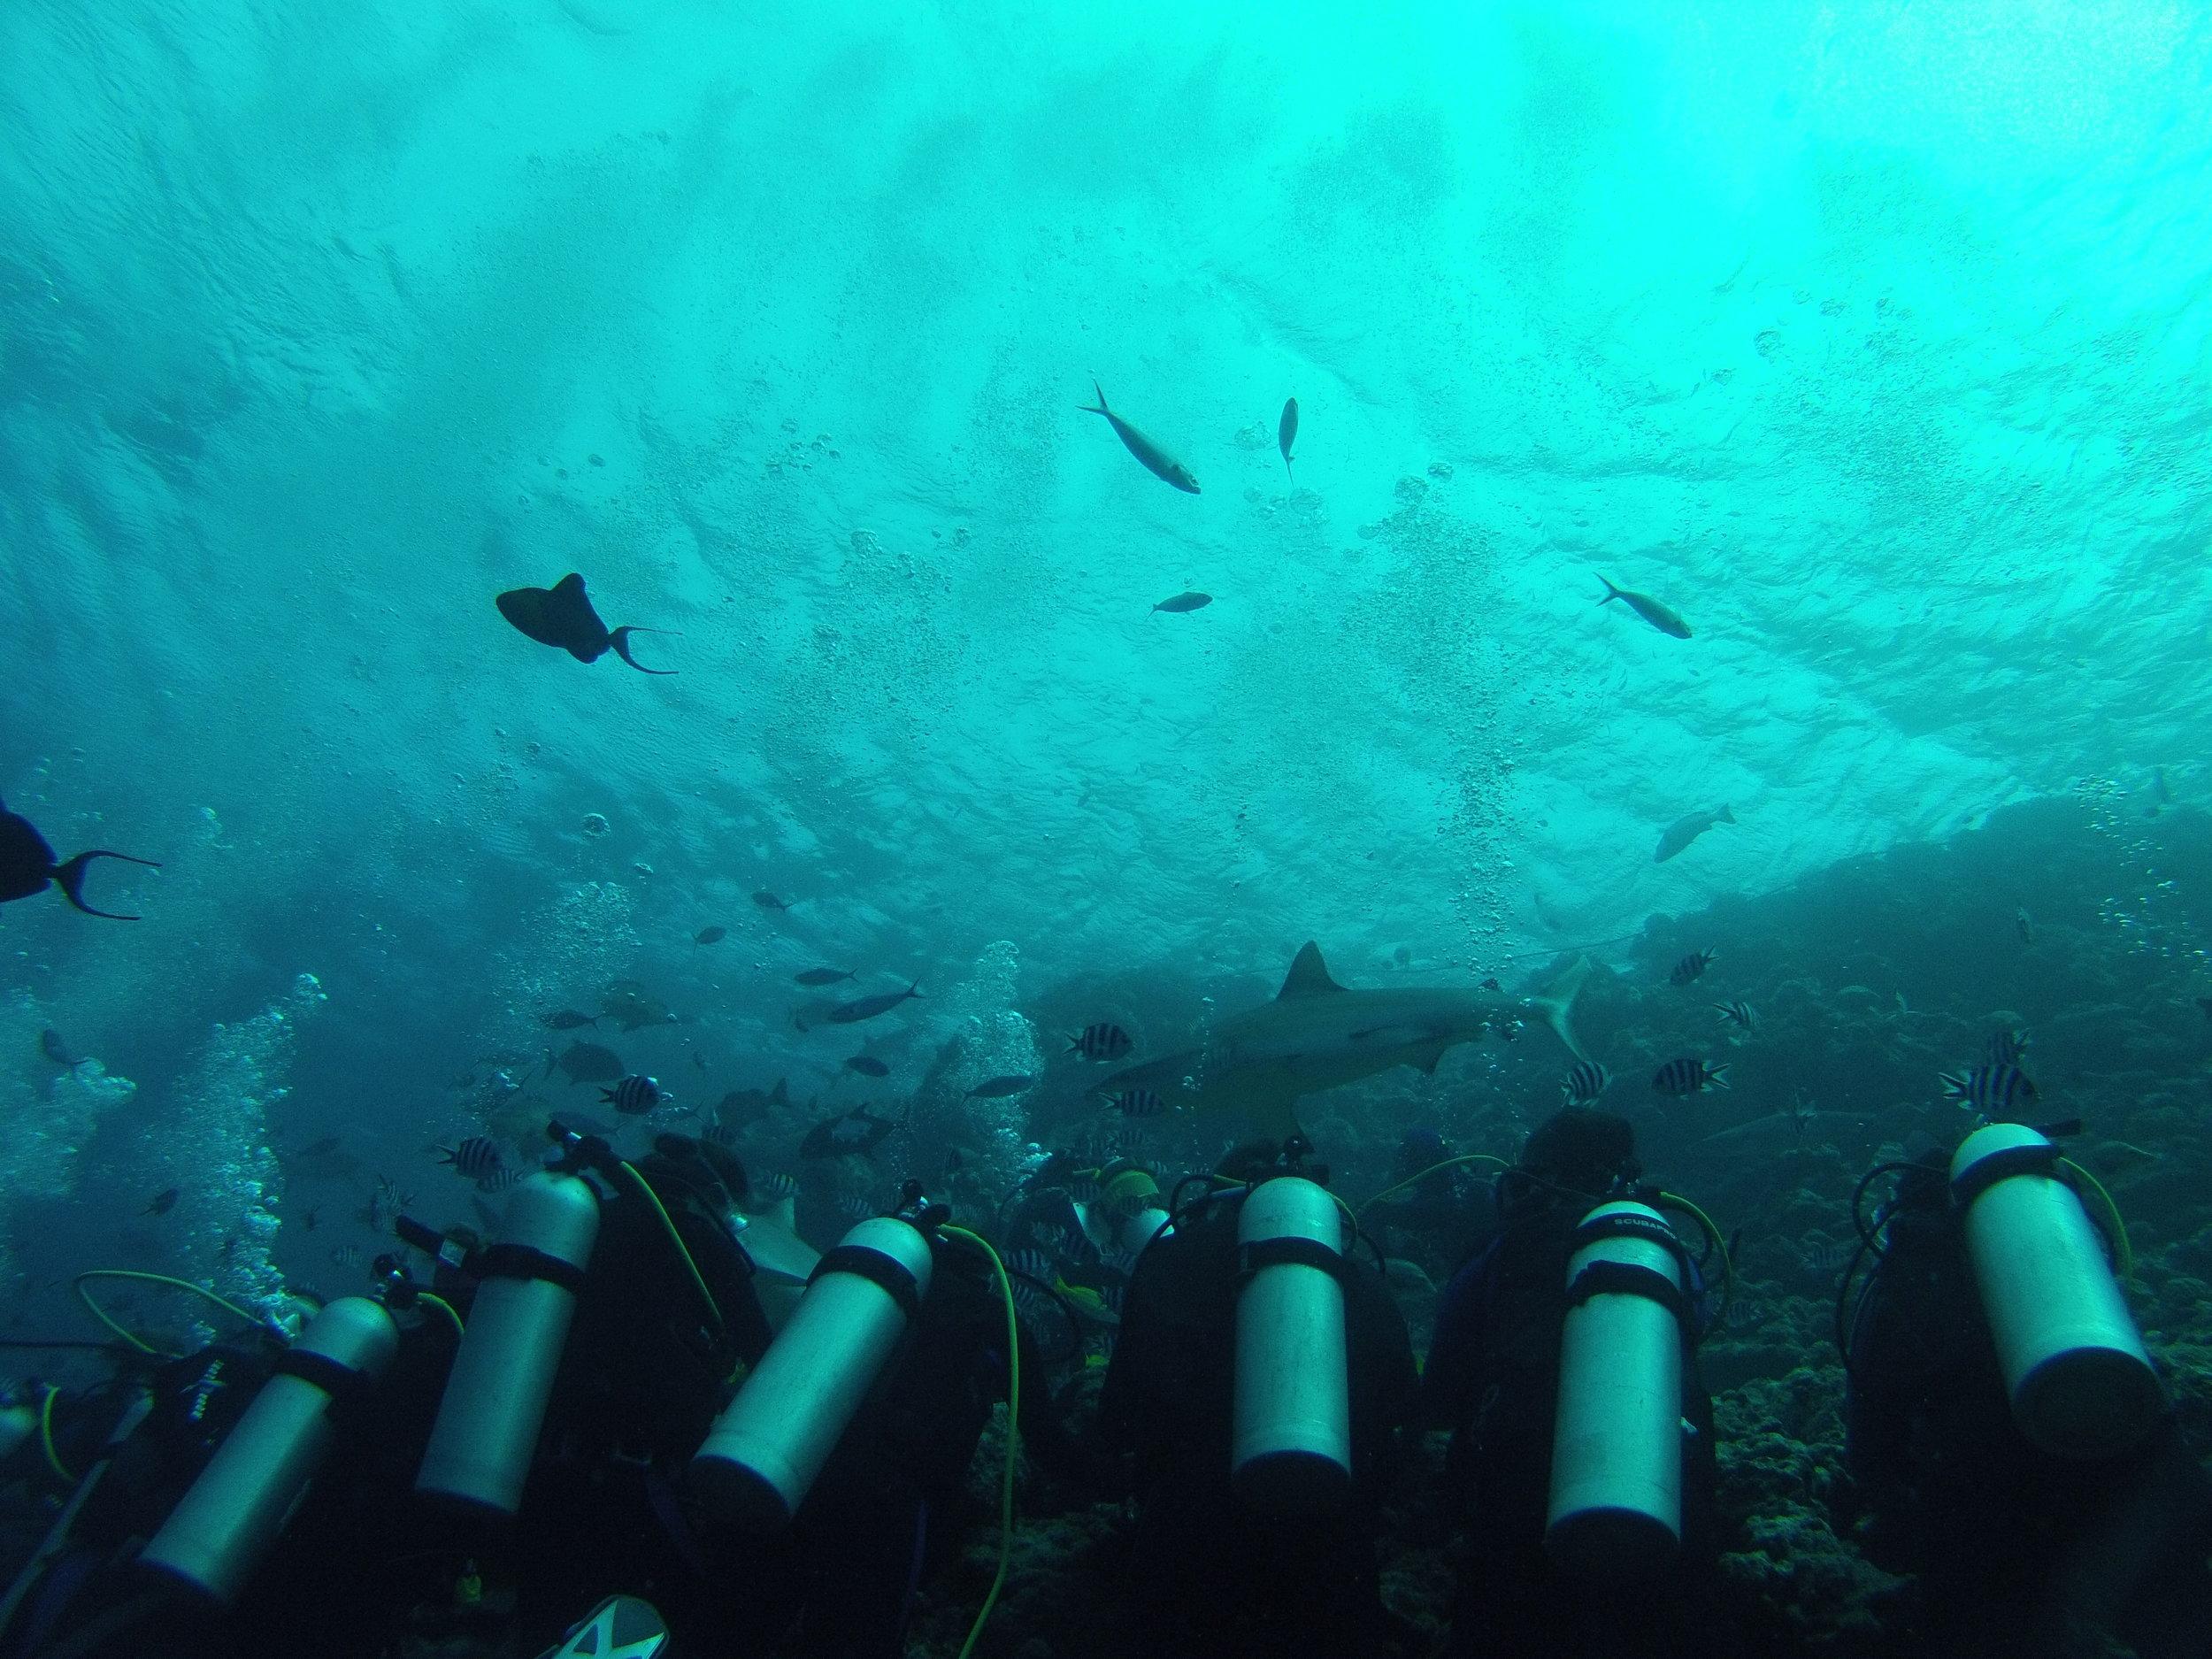 Copy of Observing sharks, Fiji